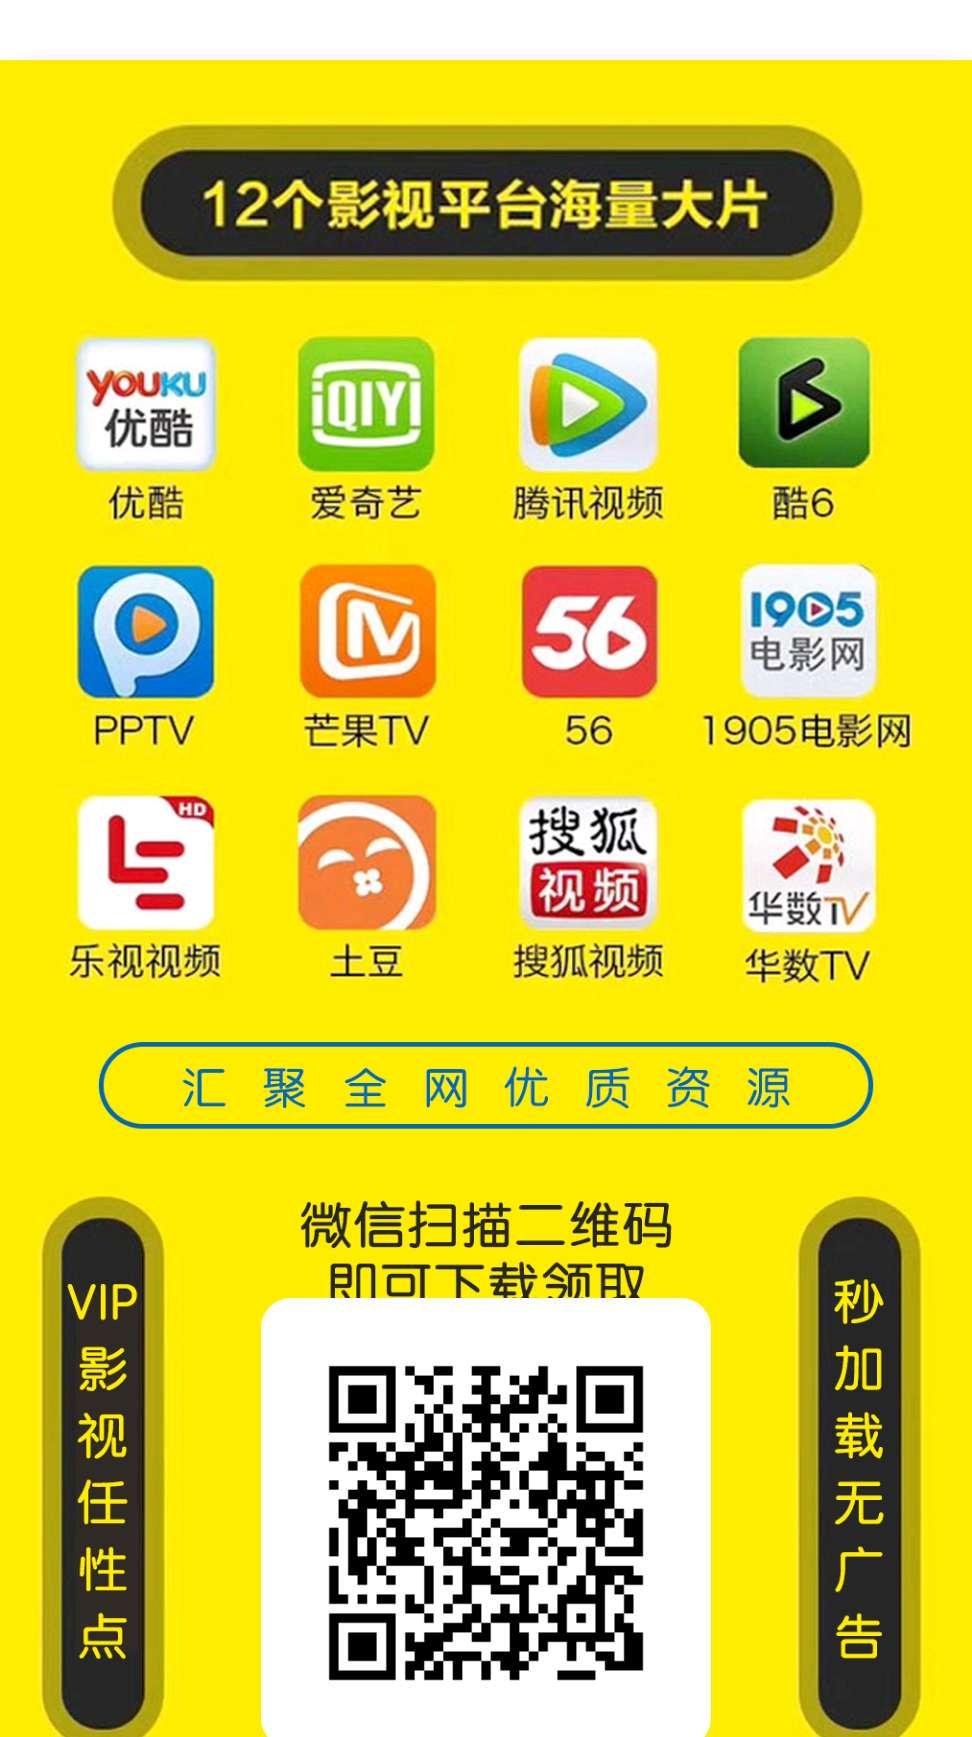 【YAYA影视官网】全网VIP影视免费看高清永久卡12个影视平台